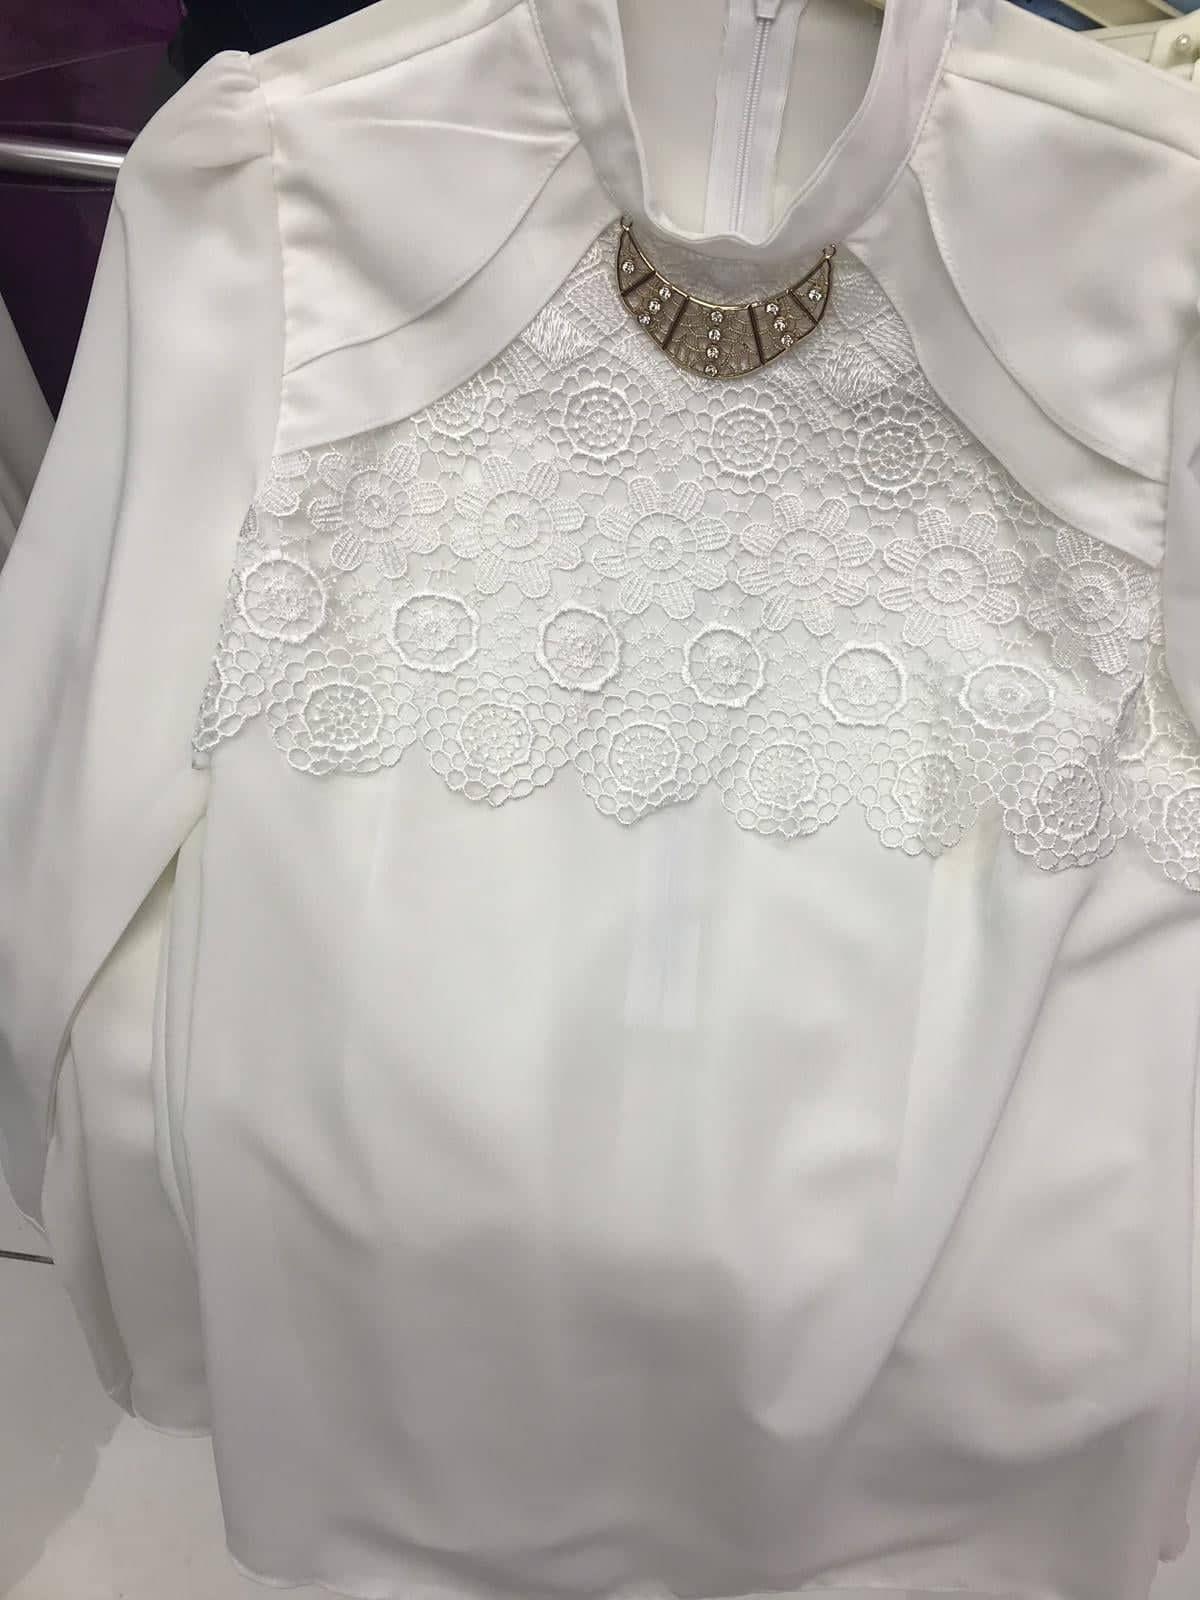 Whole Sale Optom Prodazha For Details 90 533 654 31 25 Whatsapp Russian English Bayan Ust Giyim Ust Giyim Bluz Ust